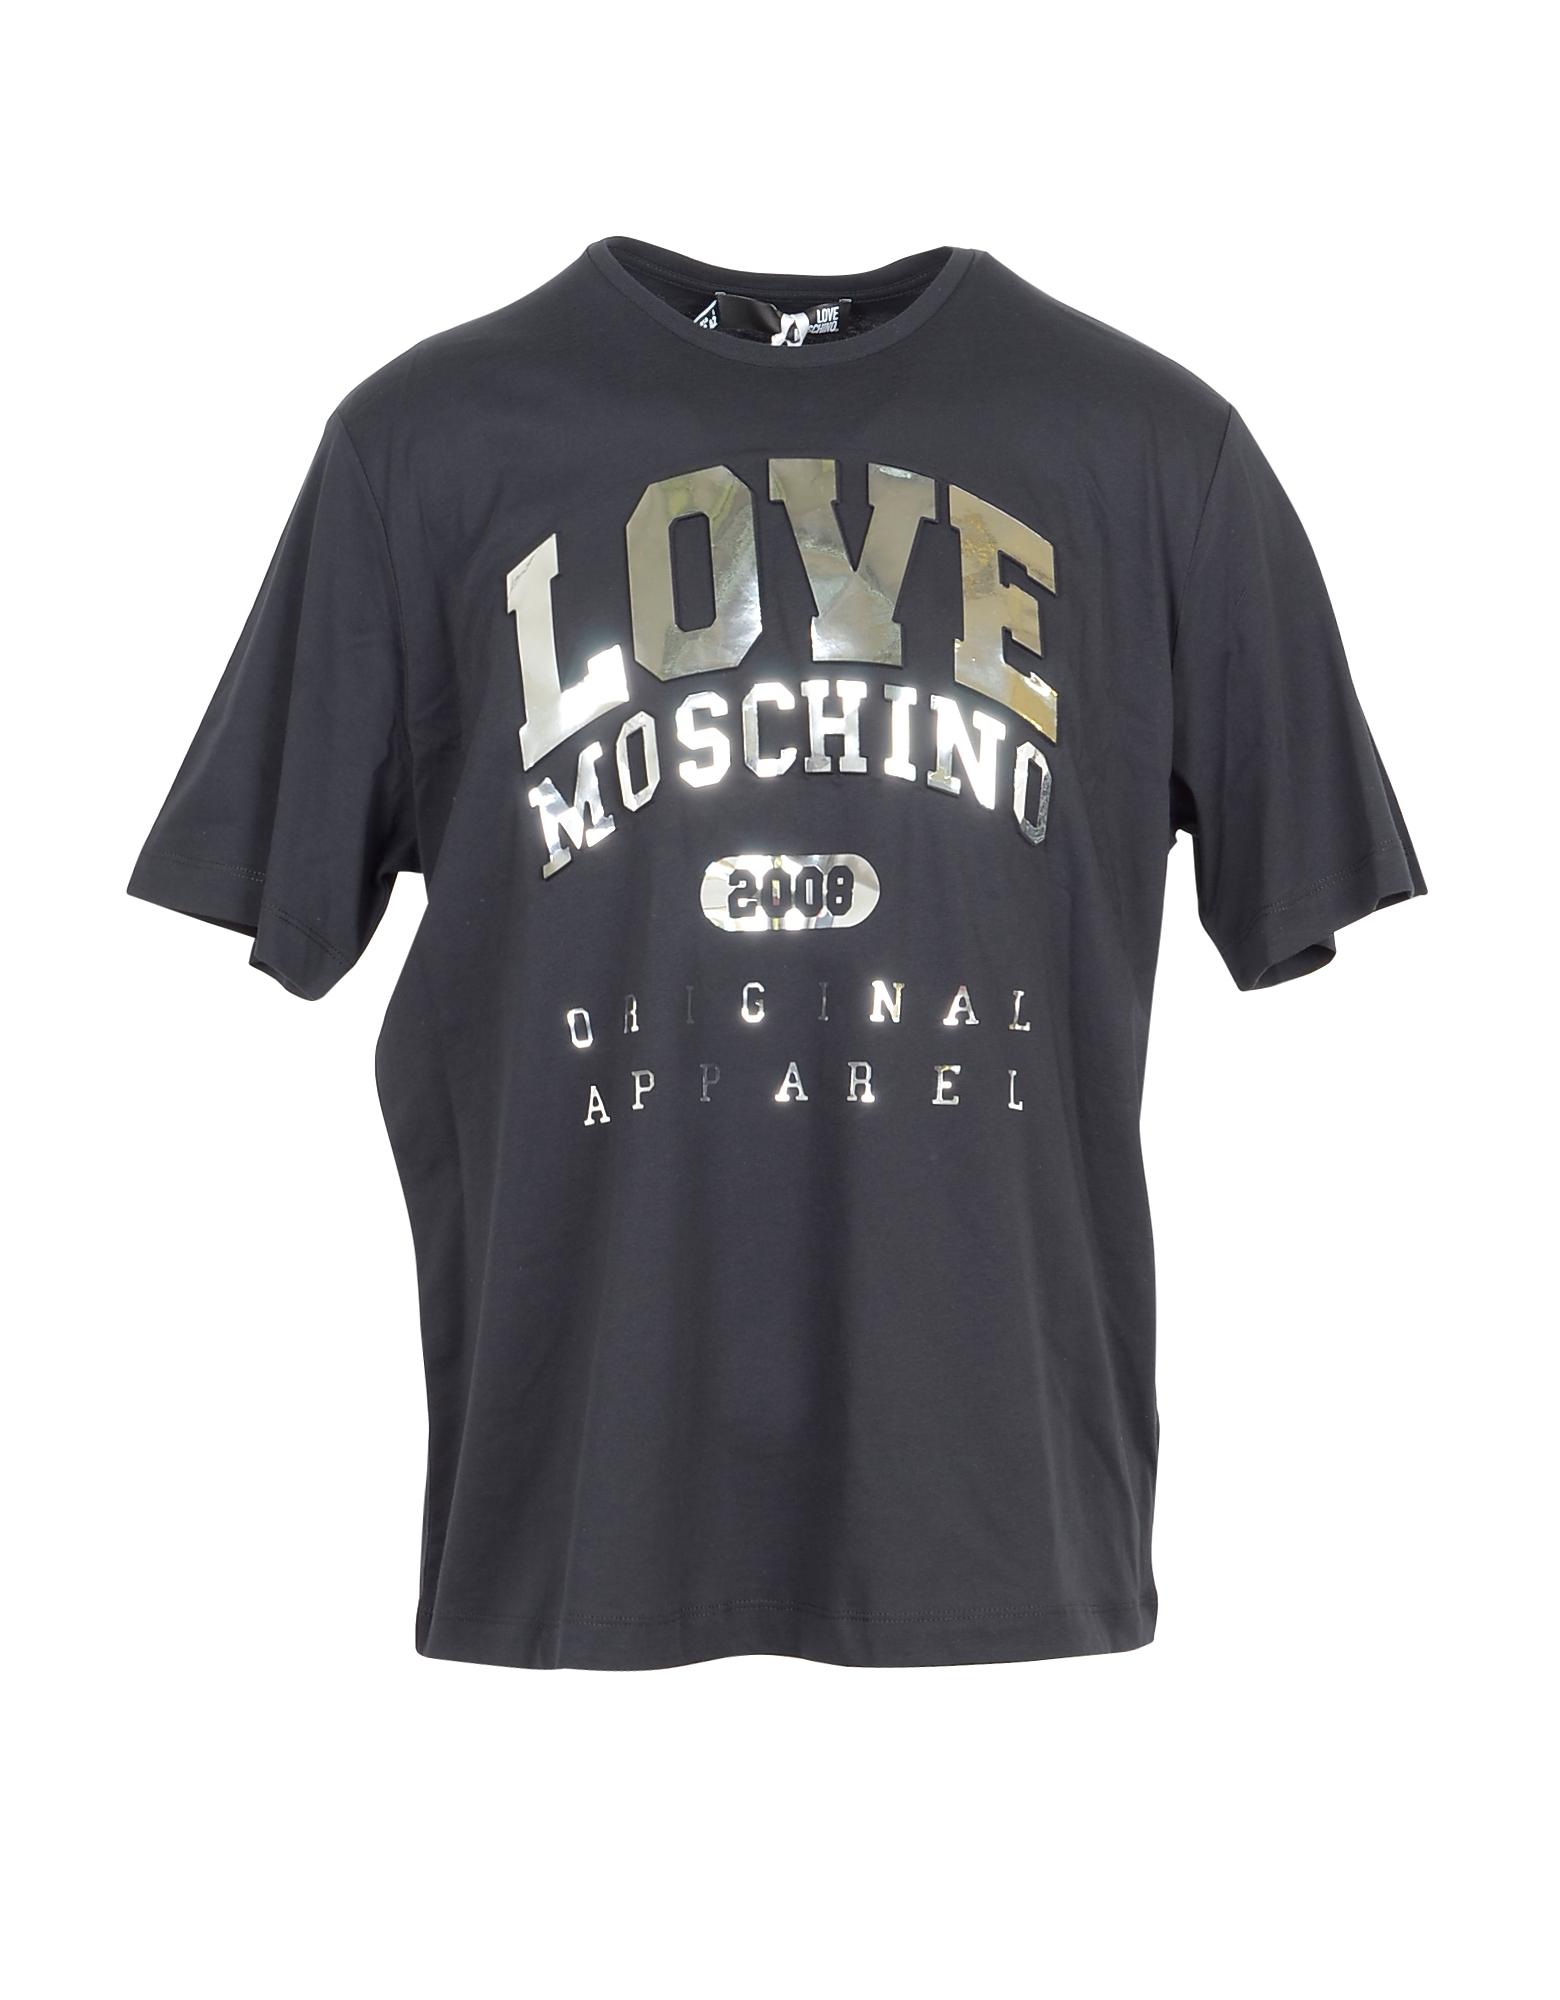 Love Moschino Designer T-Shirts & Tops, Black & Gold Signature Cotton Women's T-Shirt